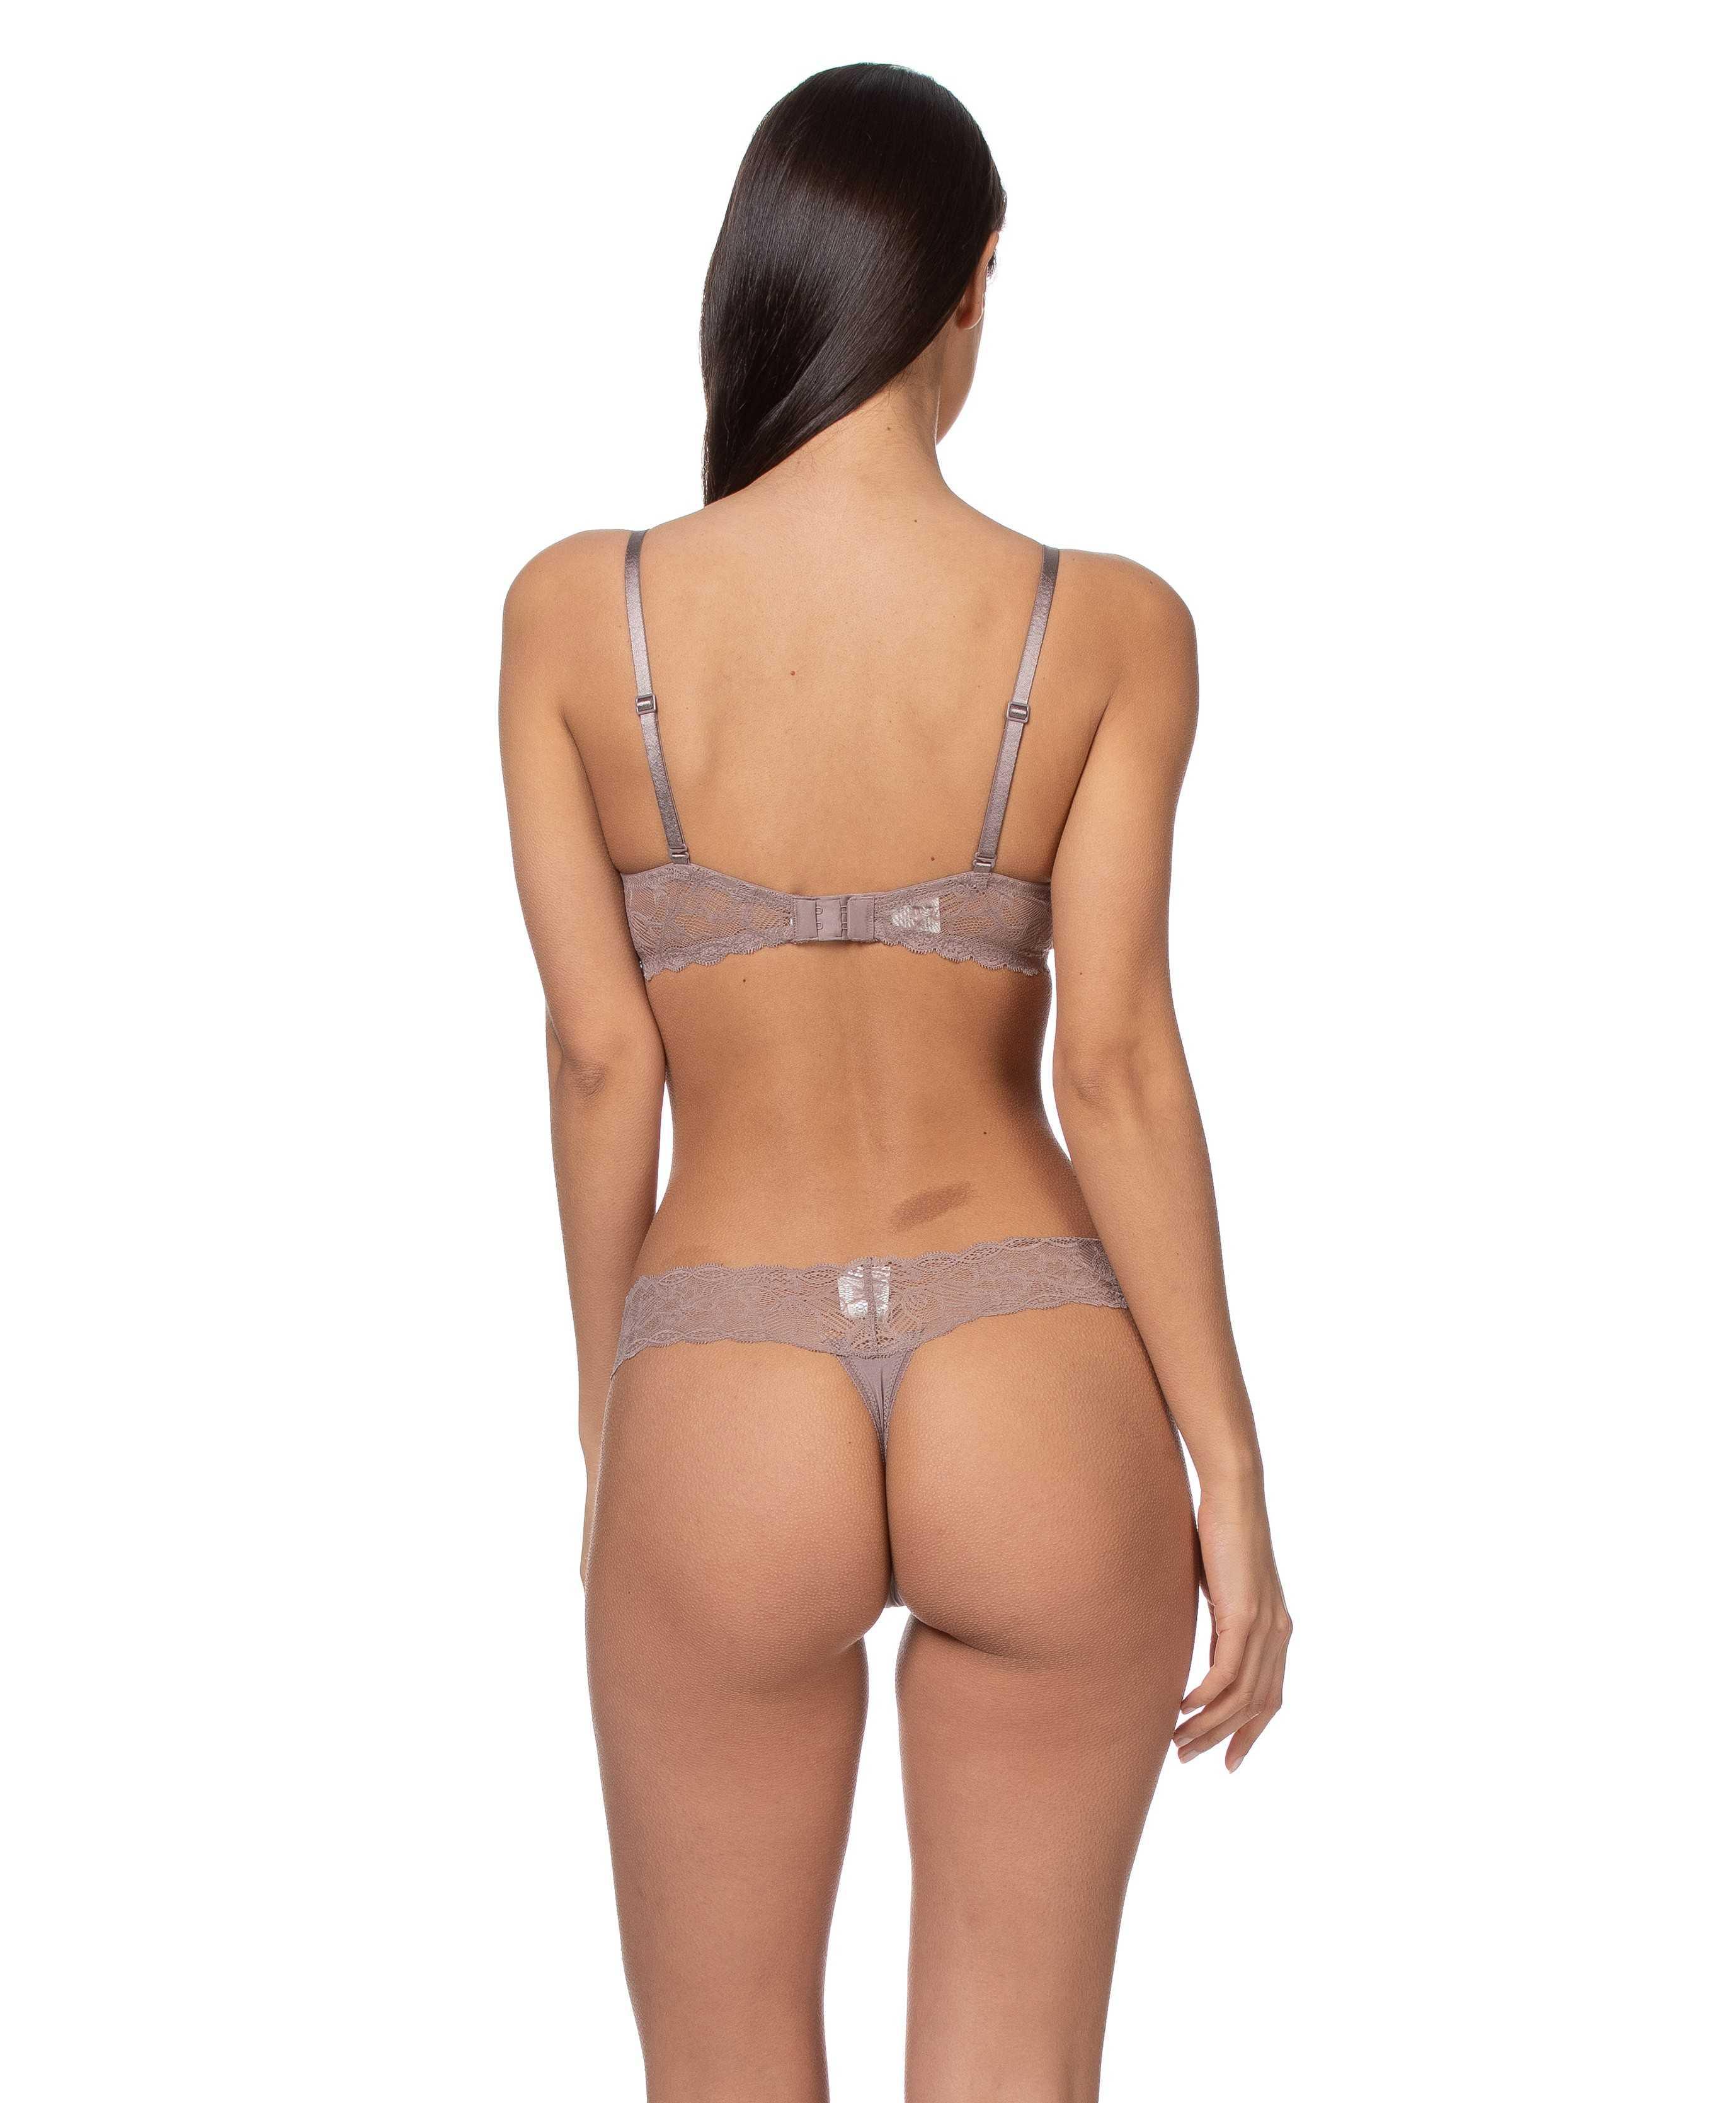 Tanga encaje seductive confort Calvin Klein TALLAS: s, m  - Braguitas  - PEPI GUERRA